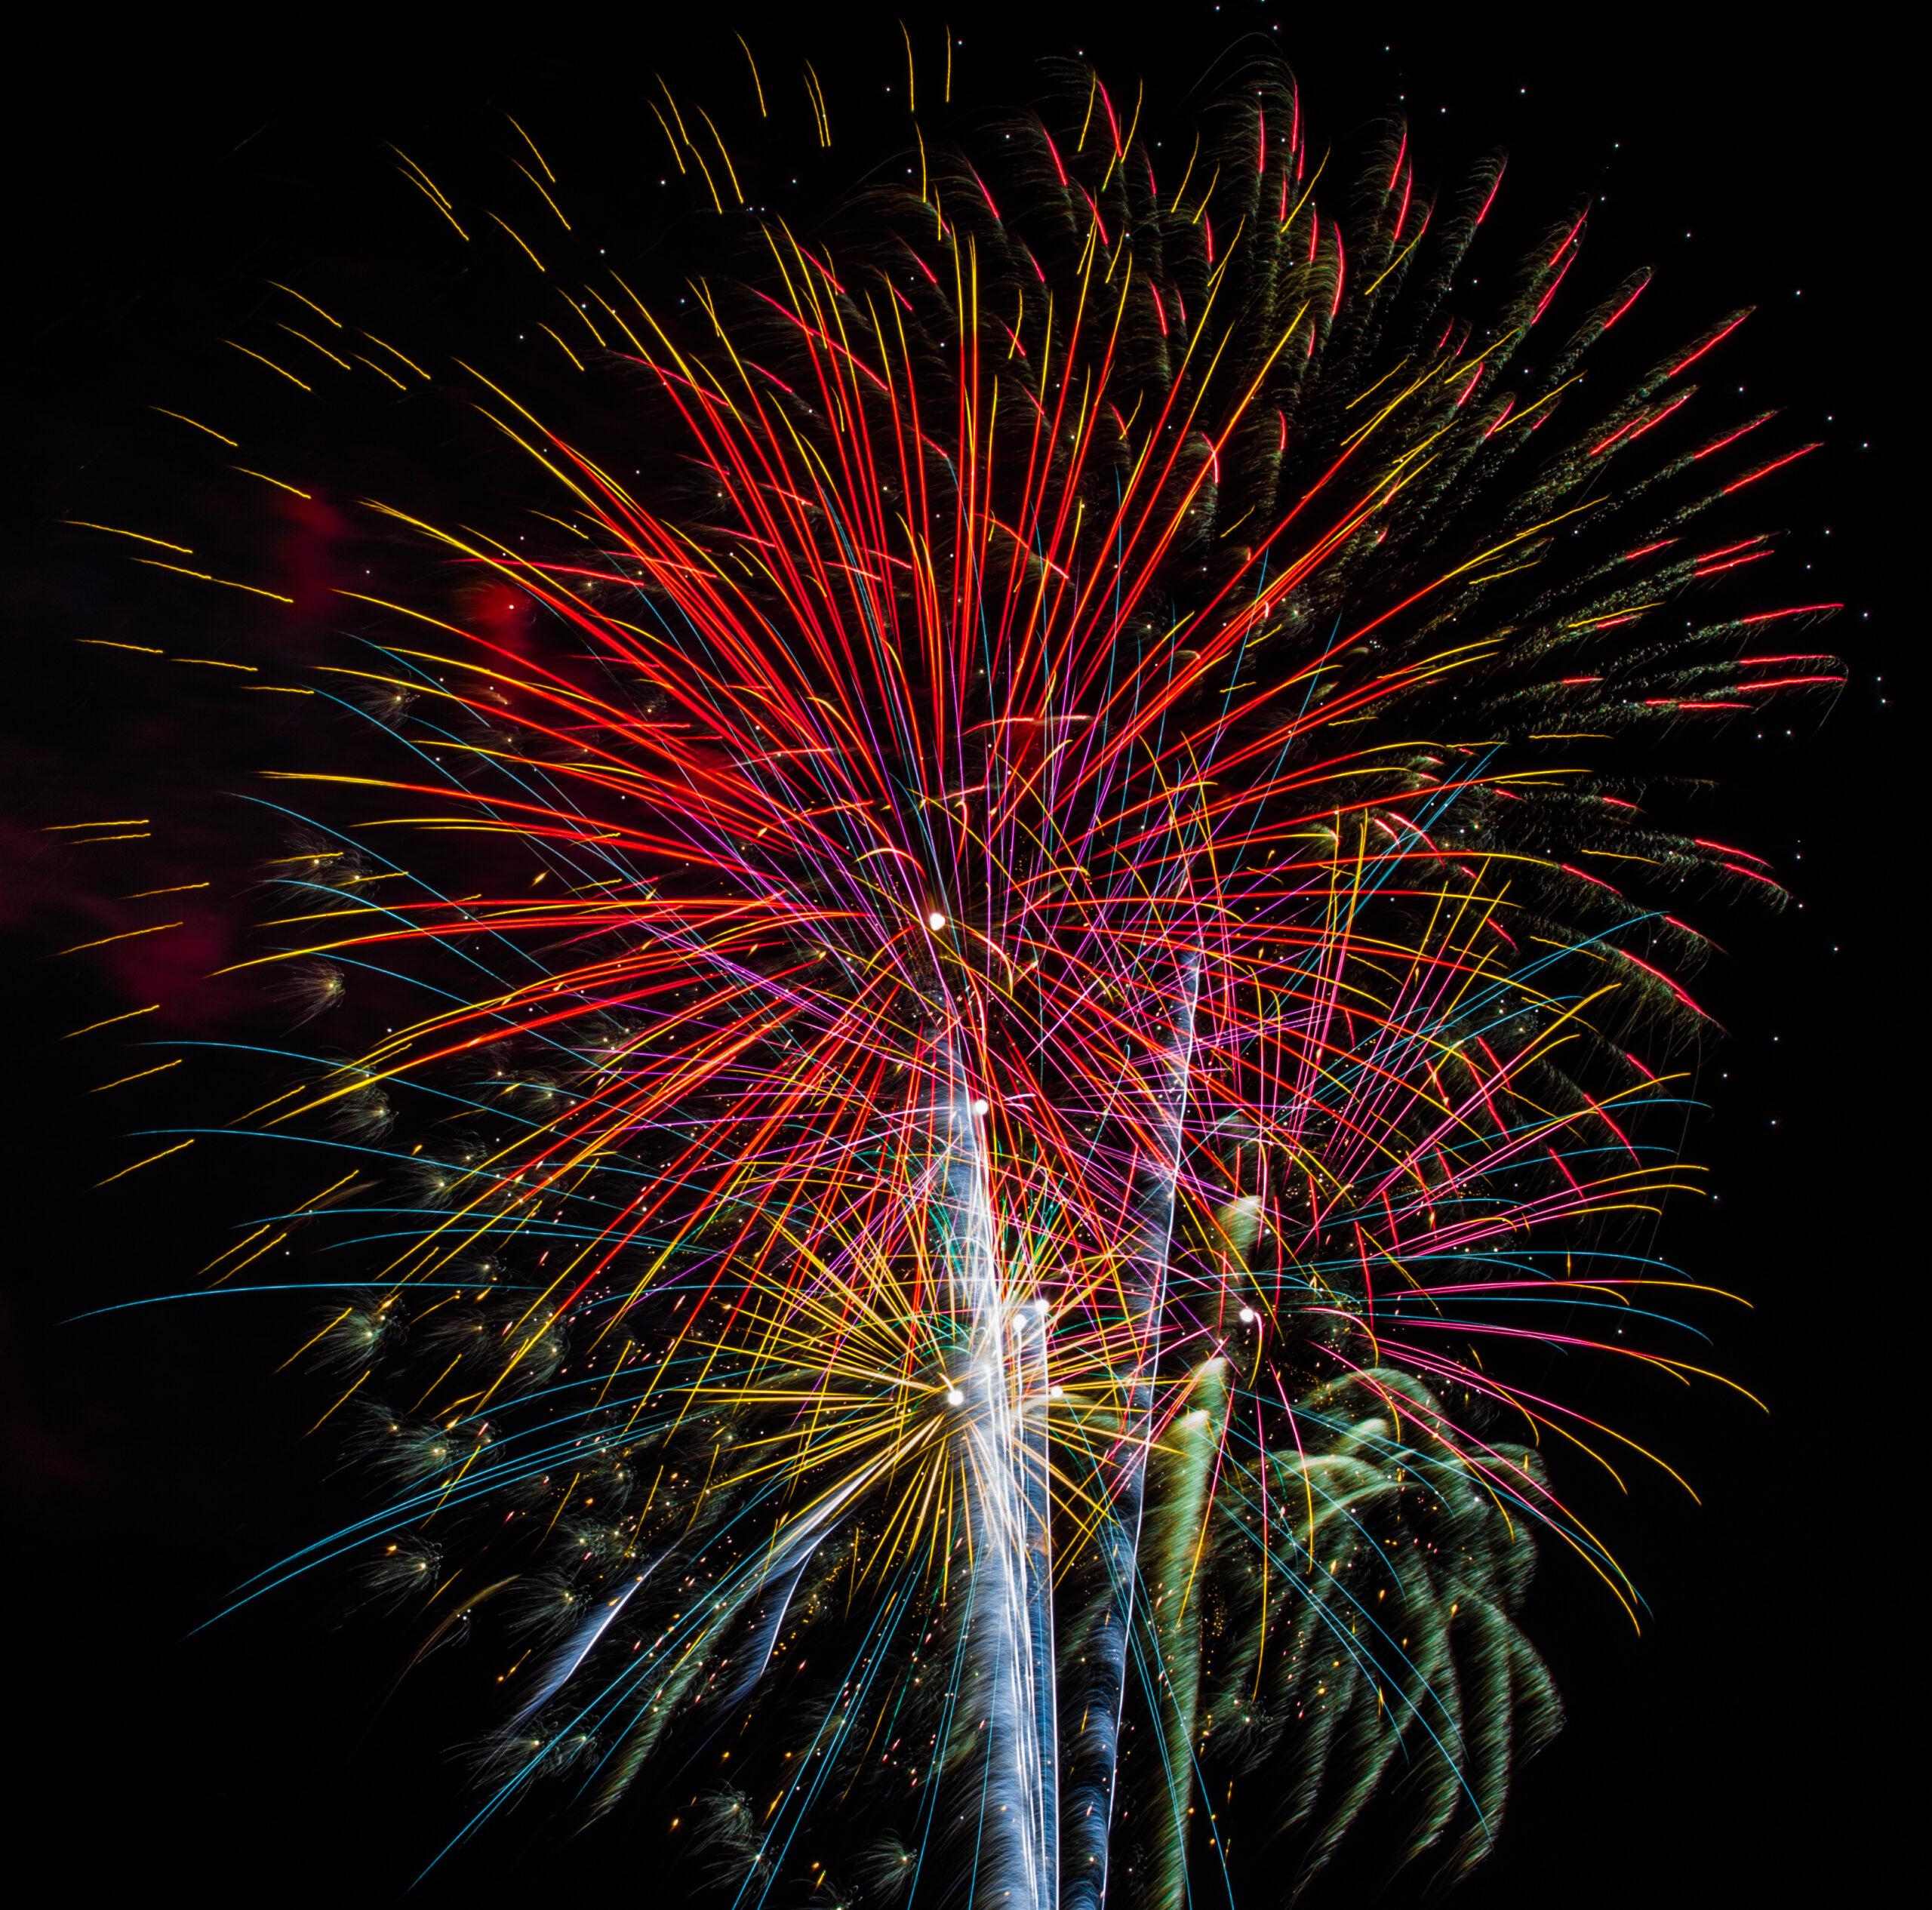 Fireworks on Savannah's Waterfront